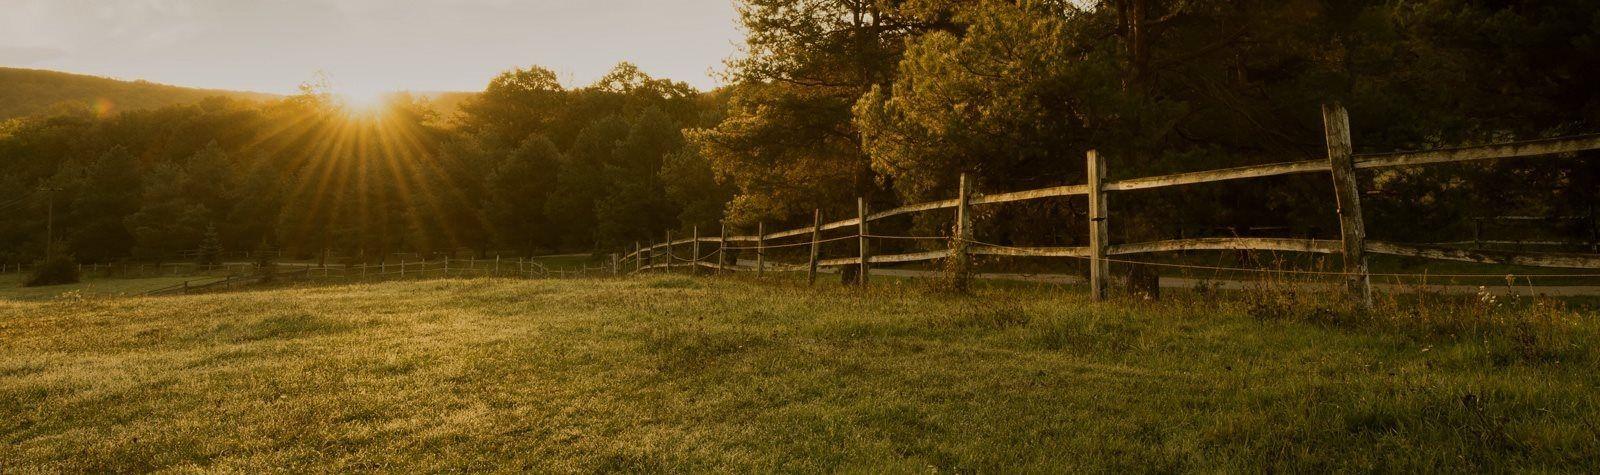 banner_paesaggio-natura